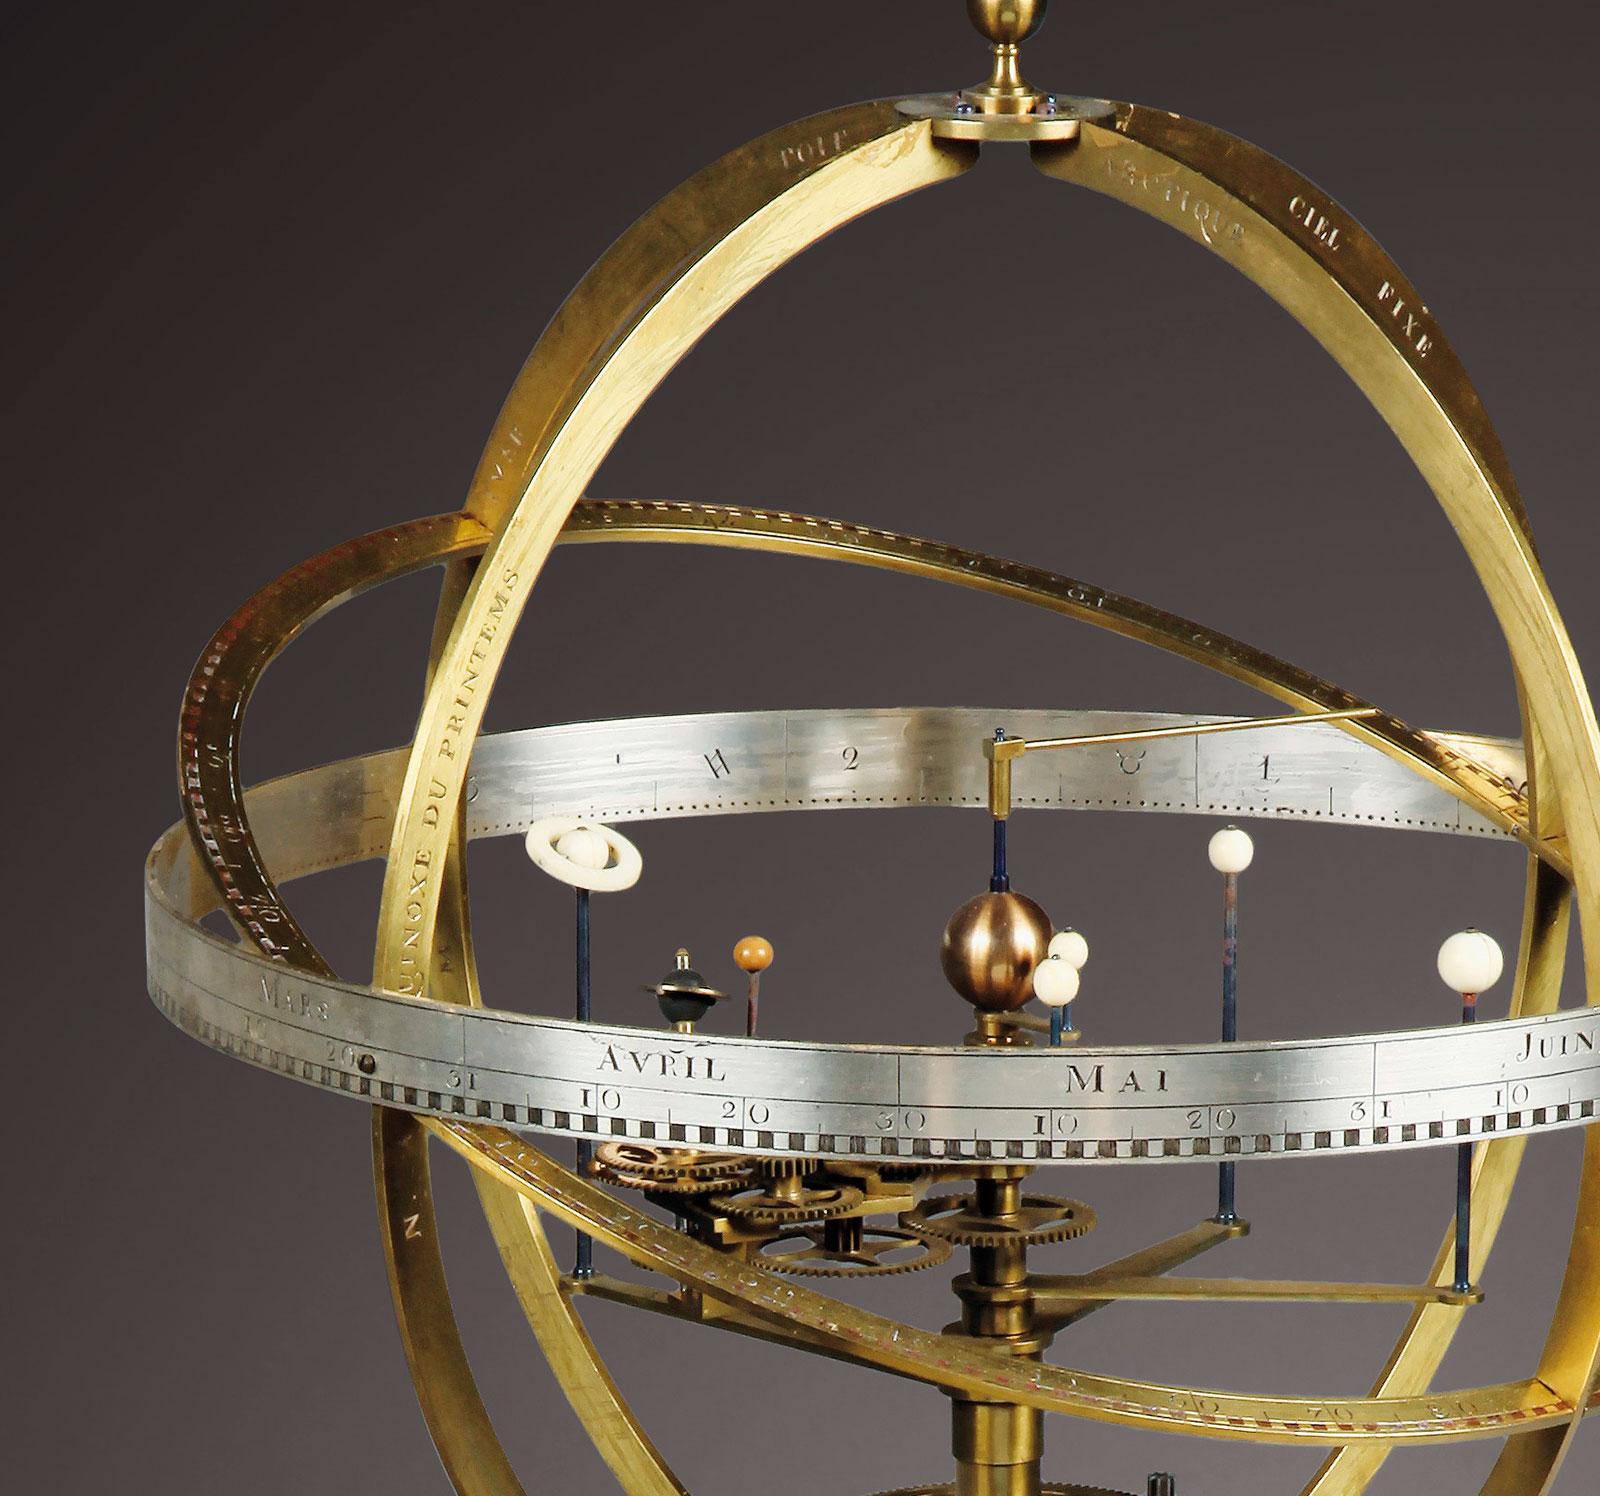 Antide Janvier armillary planetarium clock